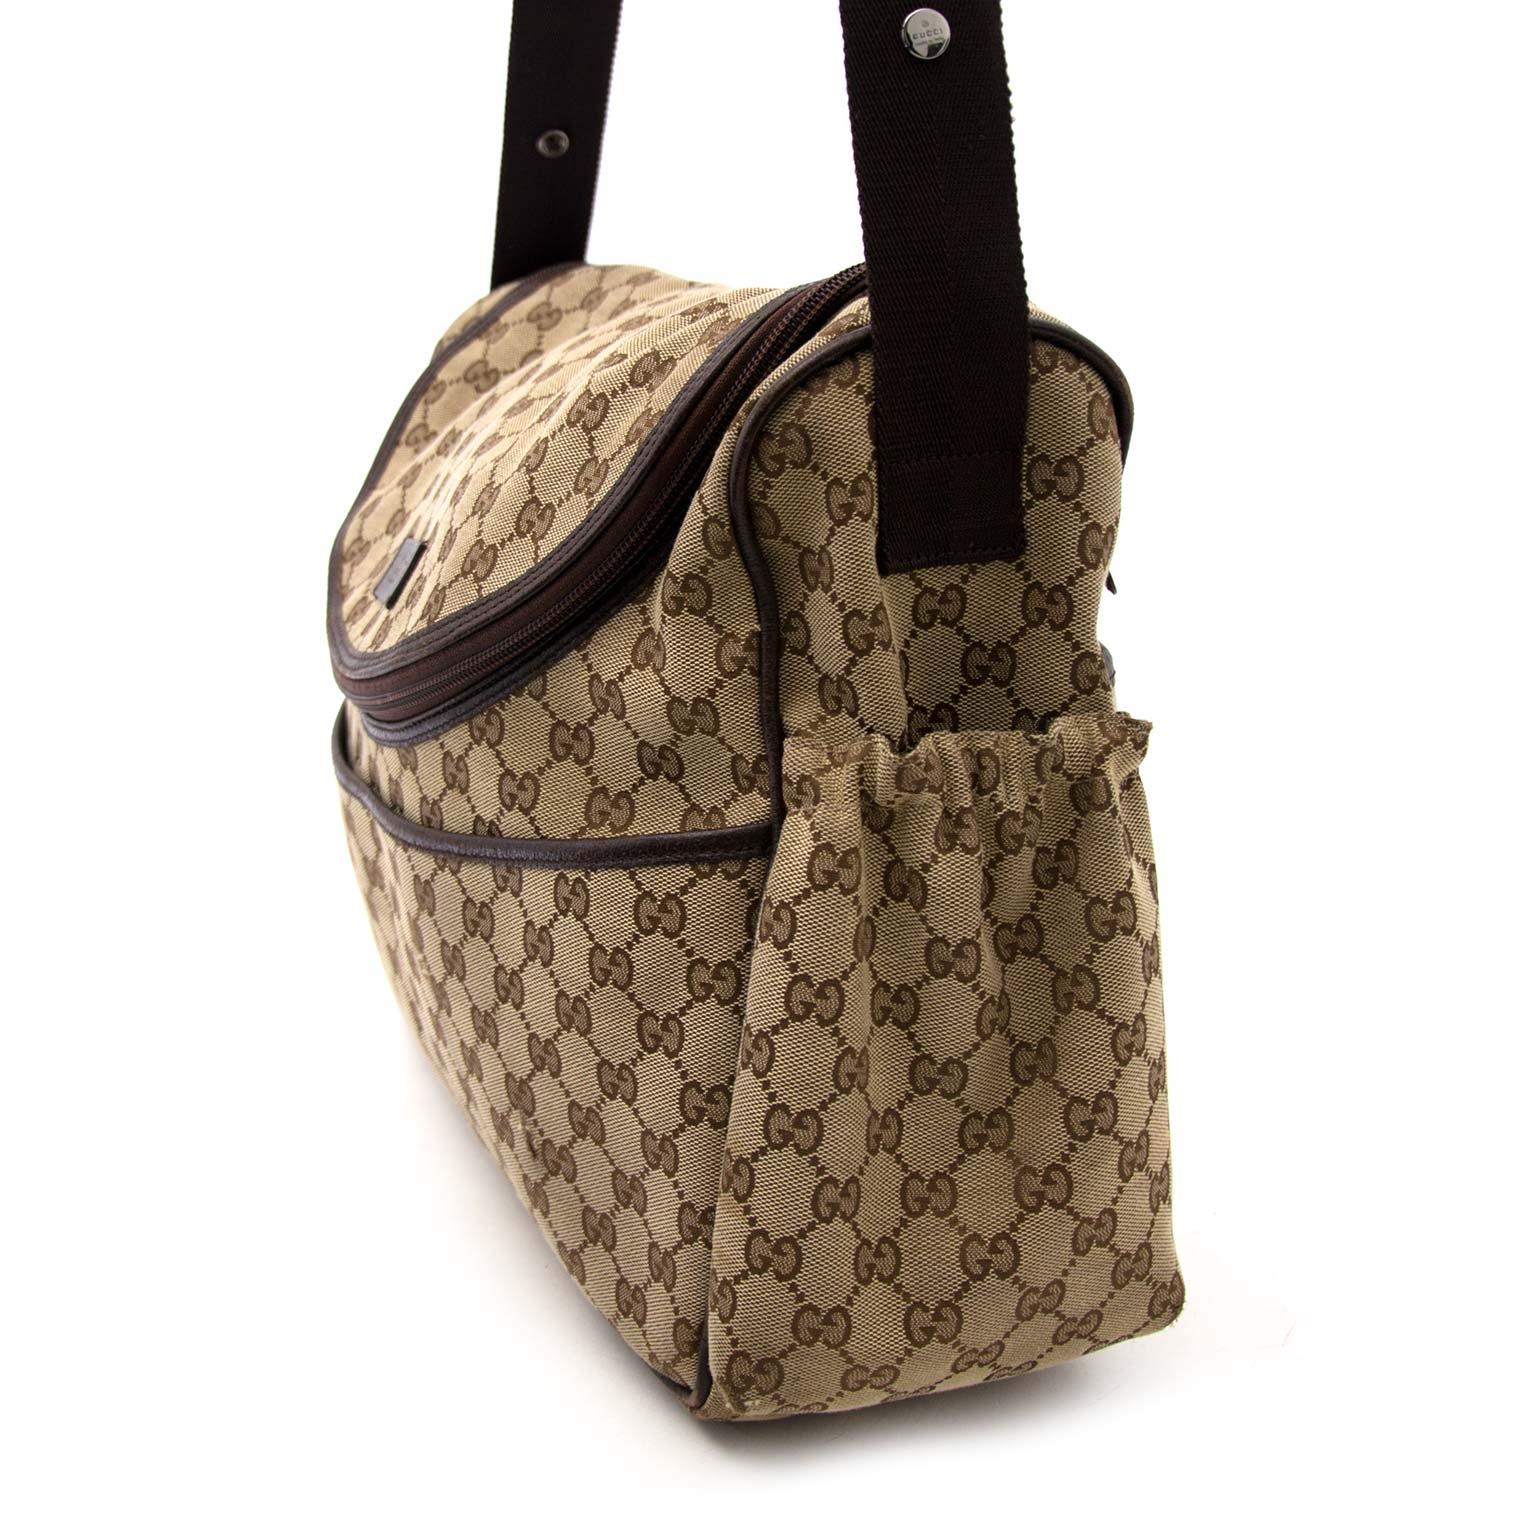 Gucci Monogram Diaper Bag Buy authentic designer Gucci secondhand bags at Labellov at the best price. Safe and secure shopping. Koop tweedehands authentieke Gucci tassen bij designer webwinkel labellov.